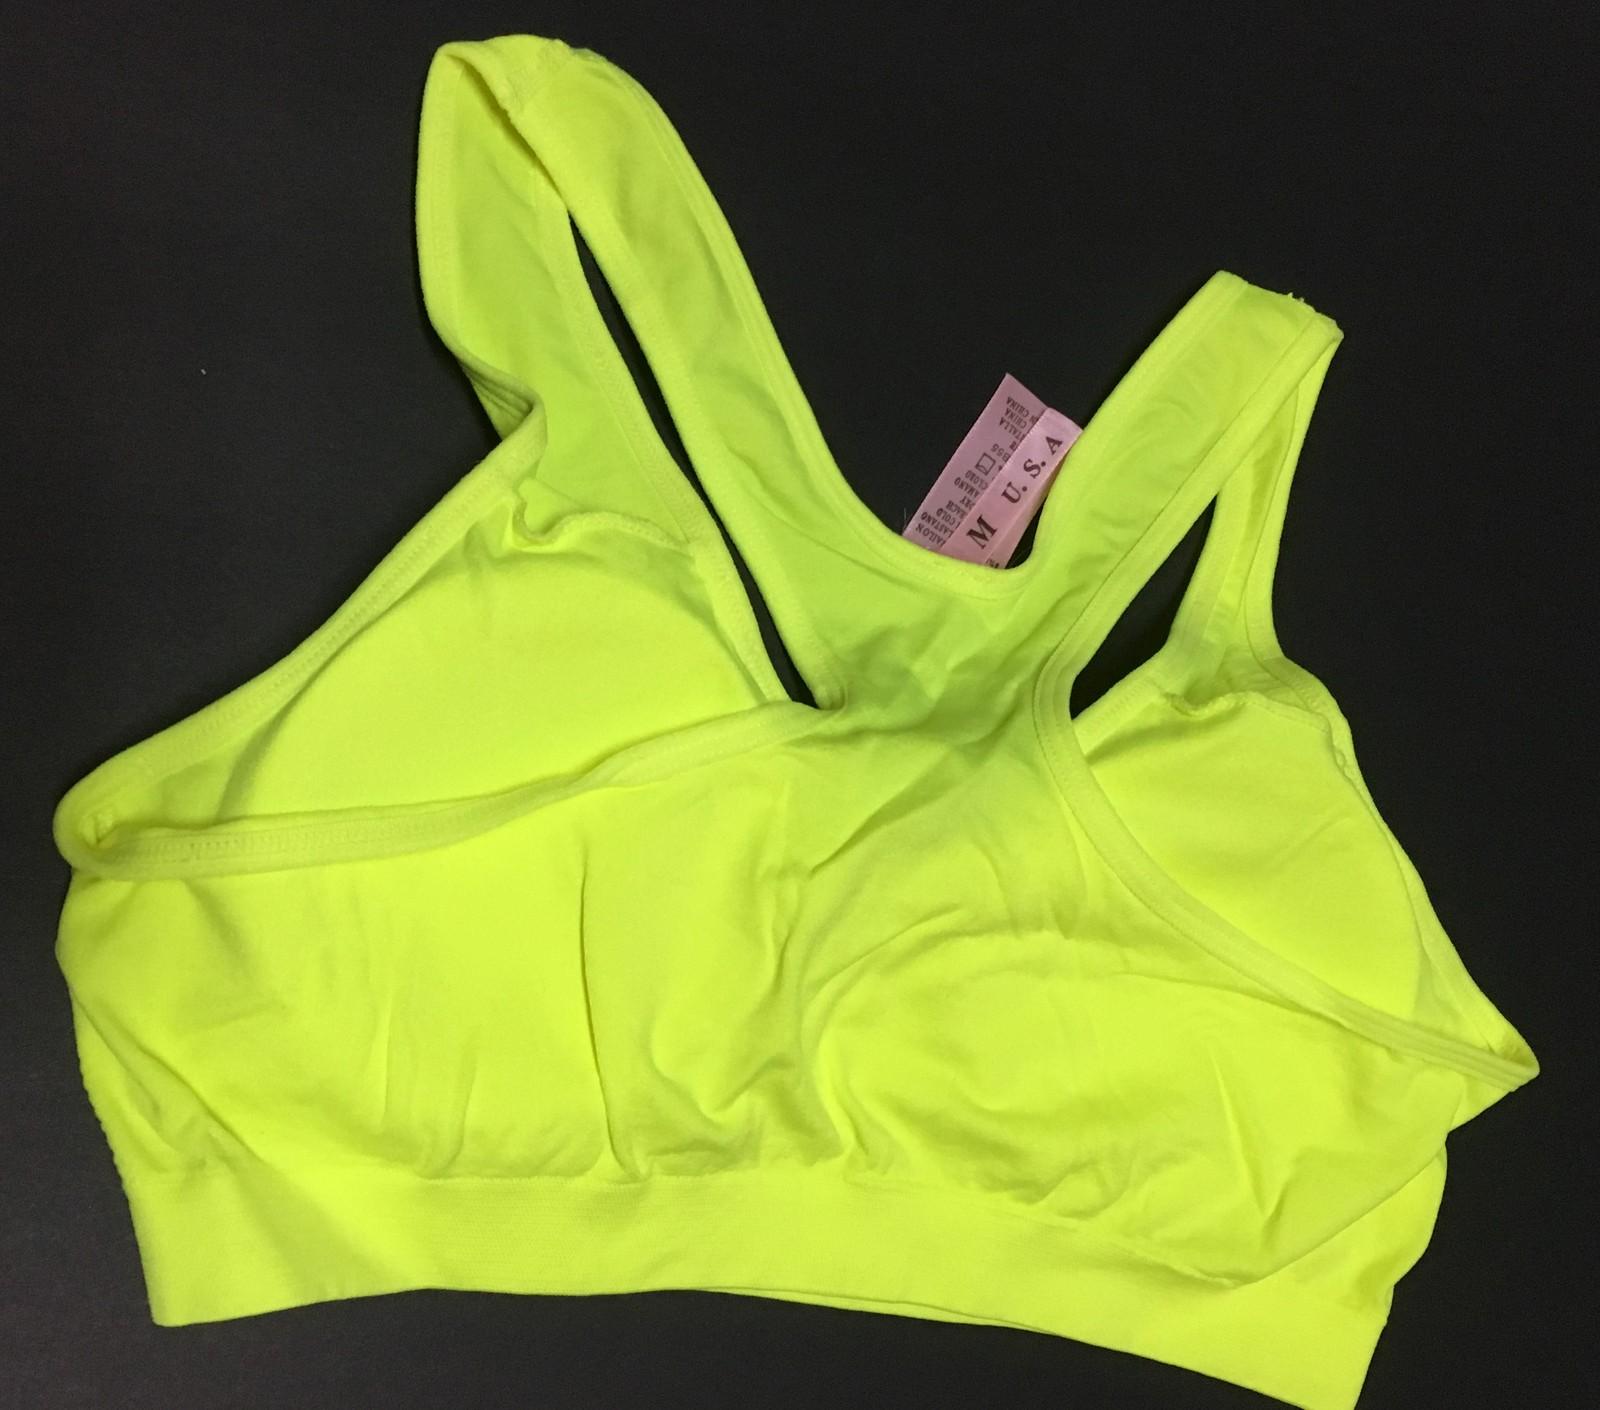 Women's Sport Support Bra Yellow SZ Medium Light Padding